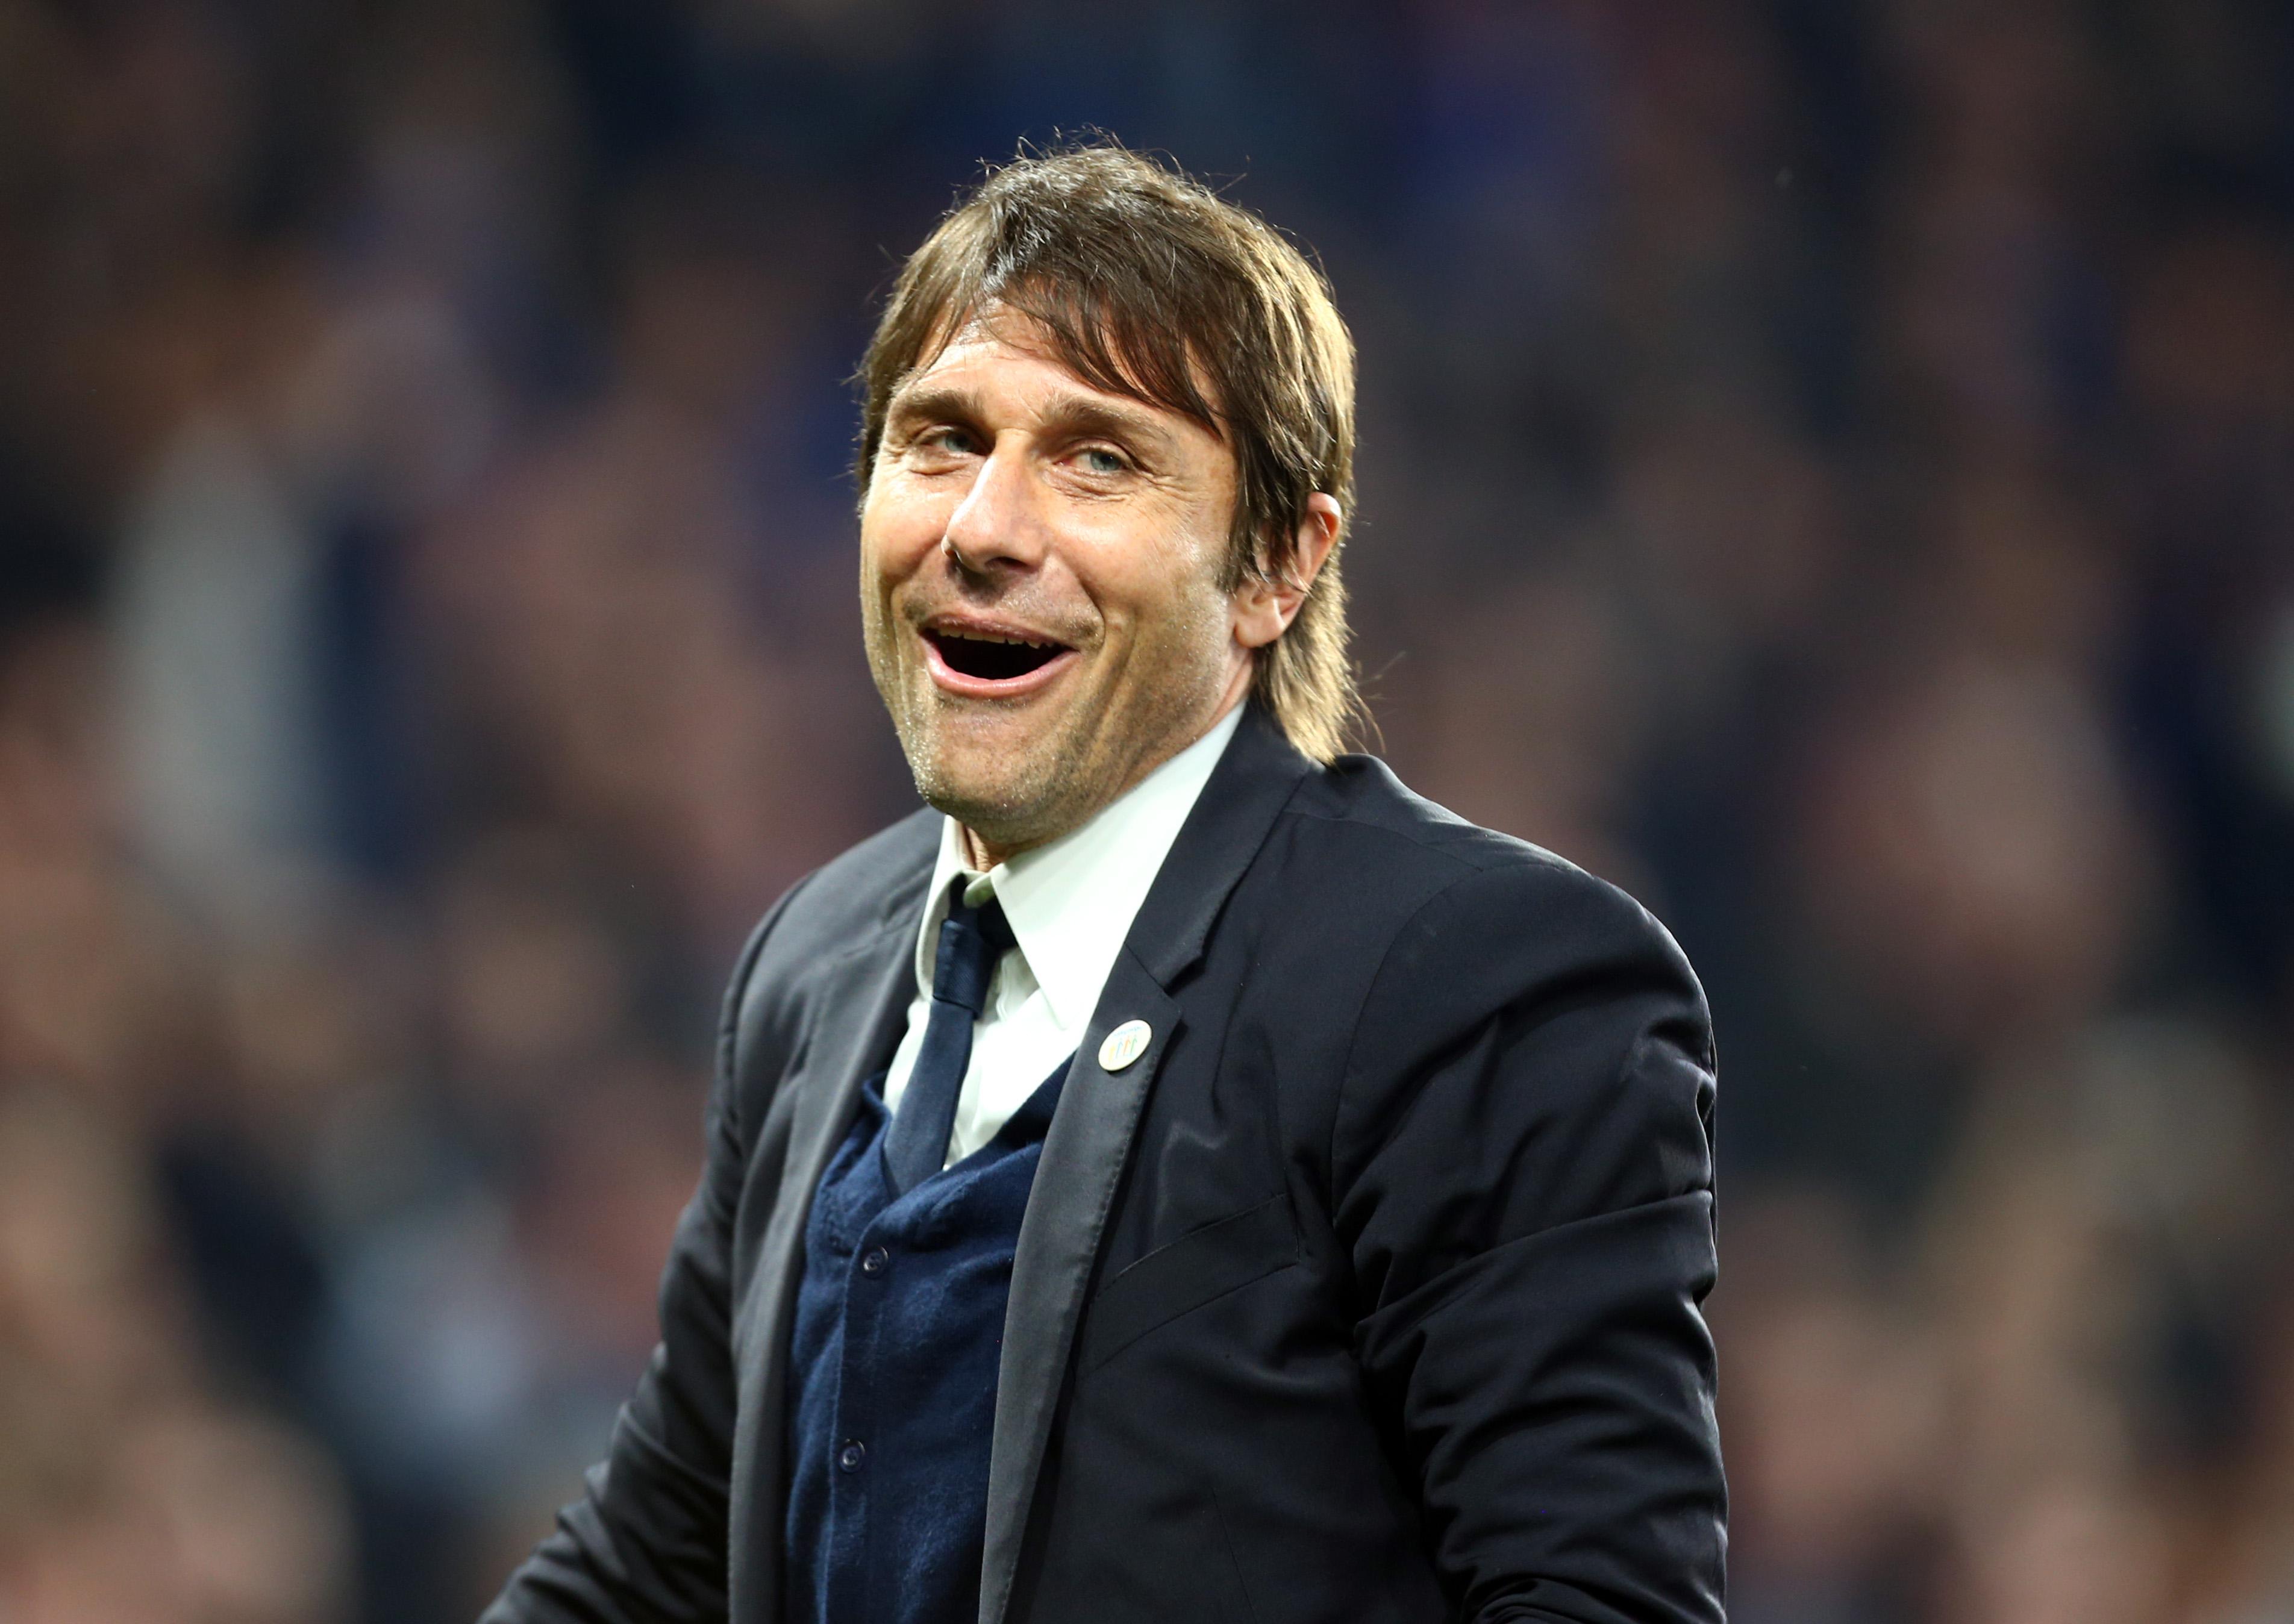 Chelsea set to sign Tiemoue Bakayoko from Monaco for £35m